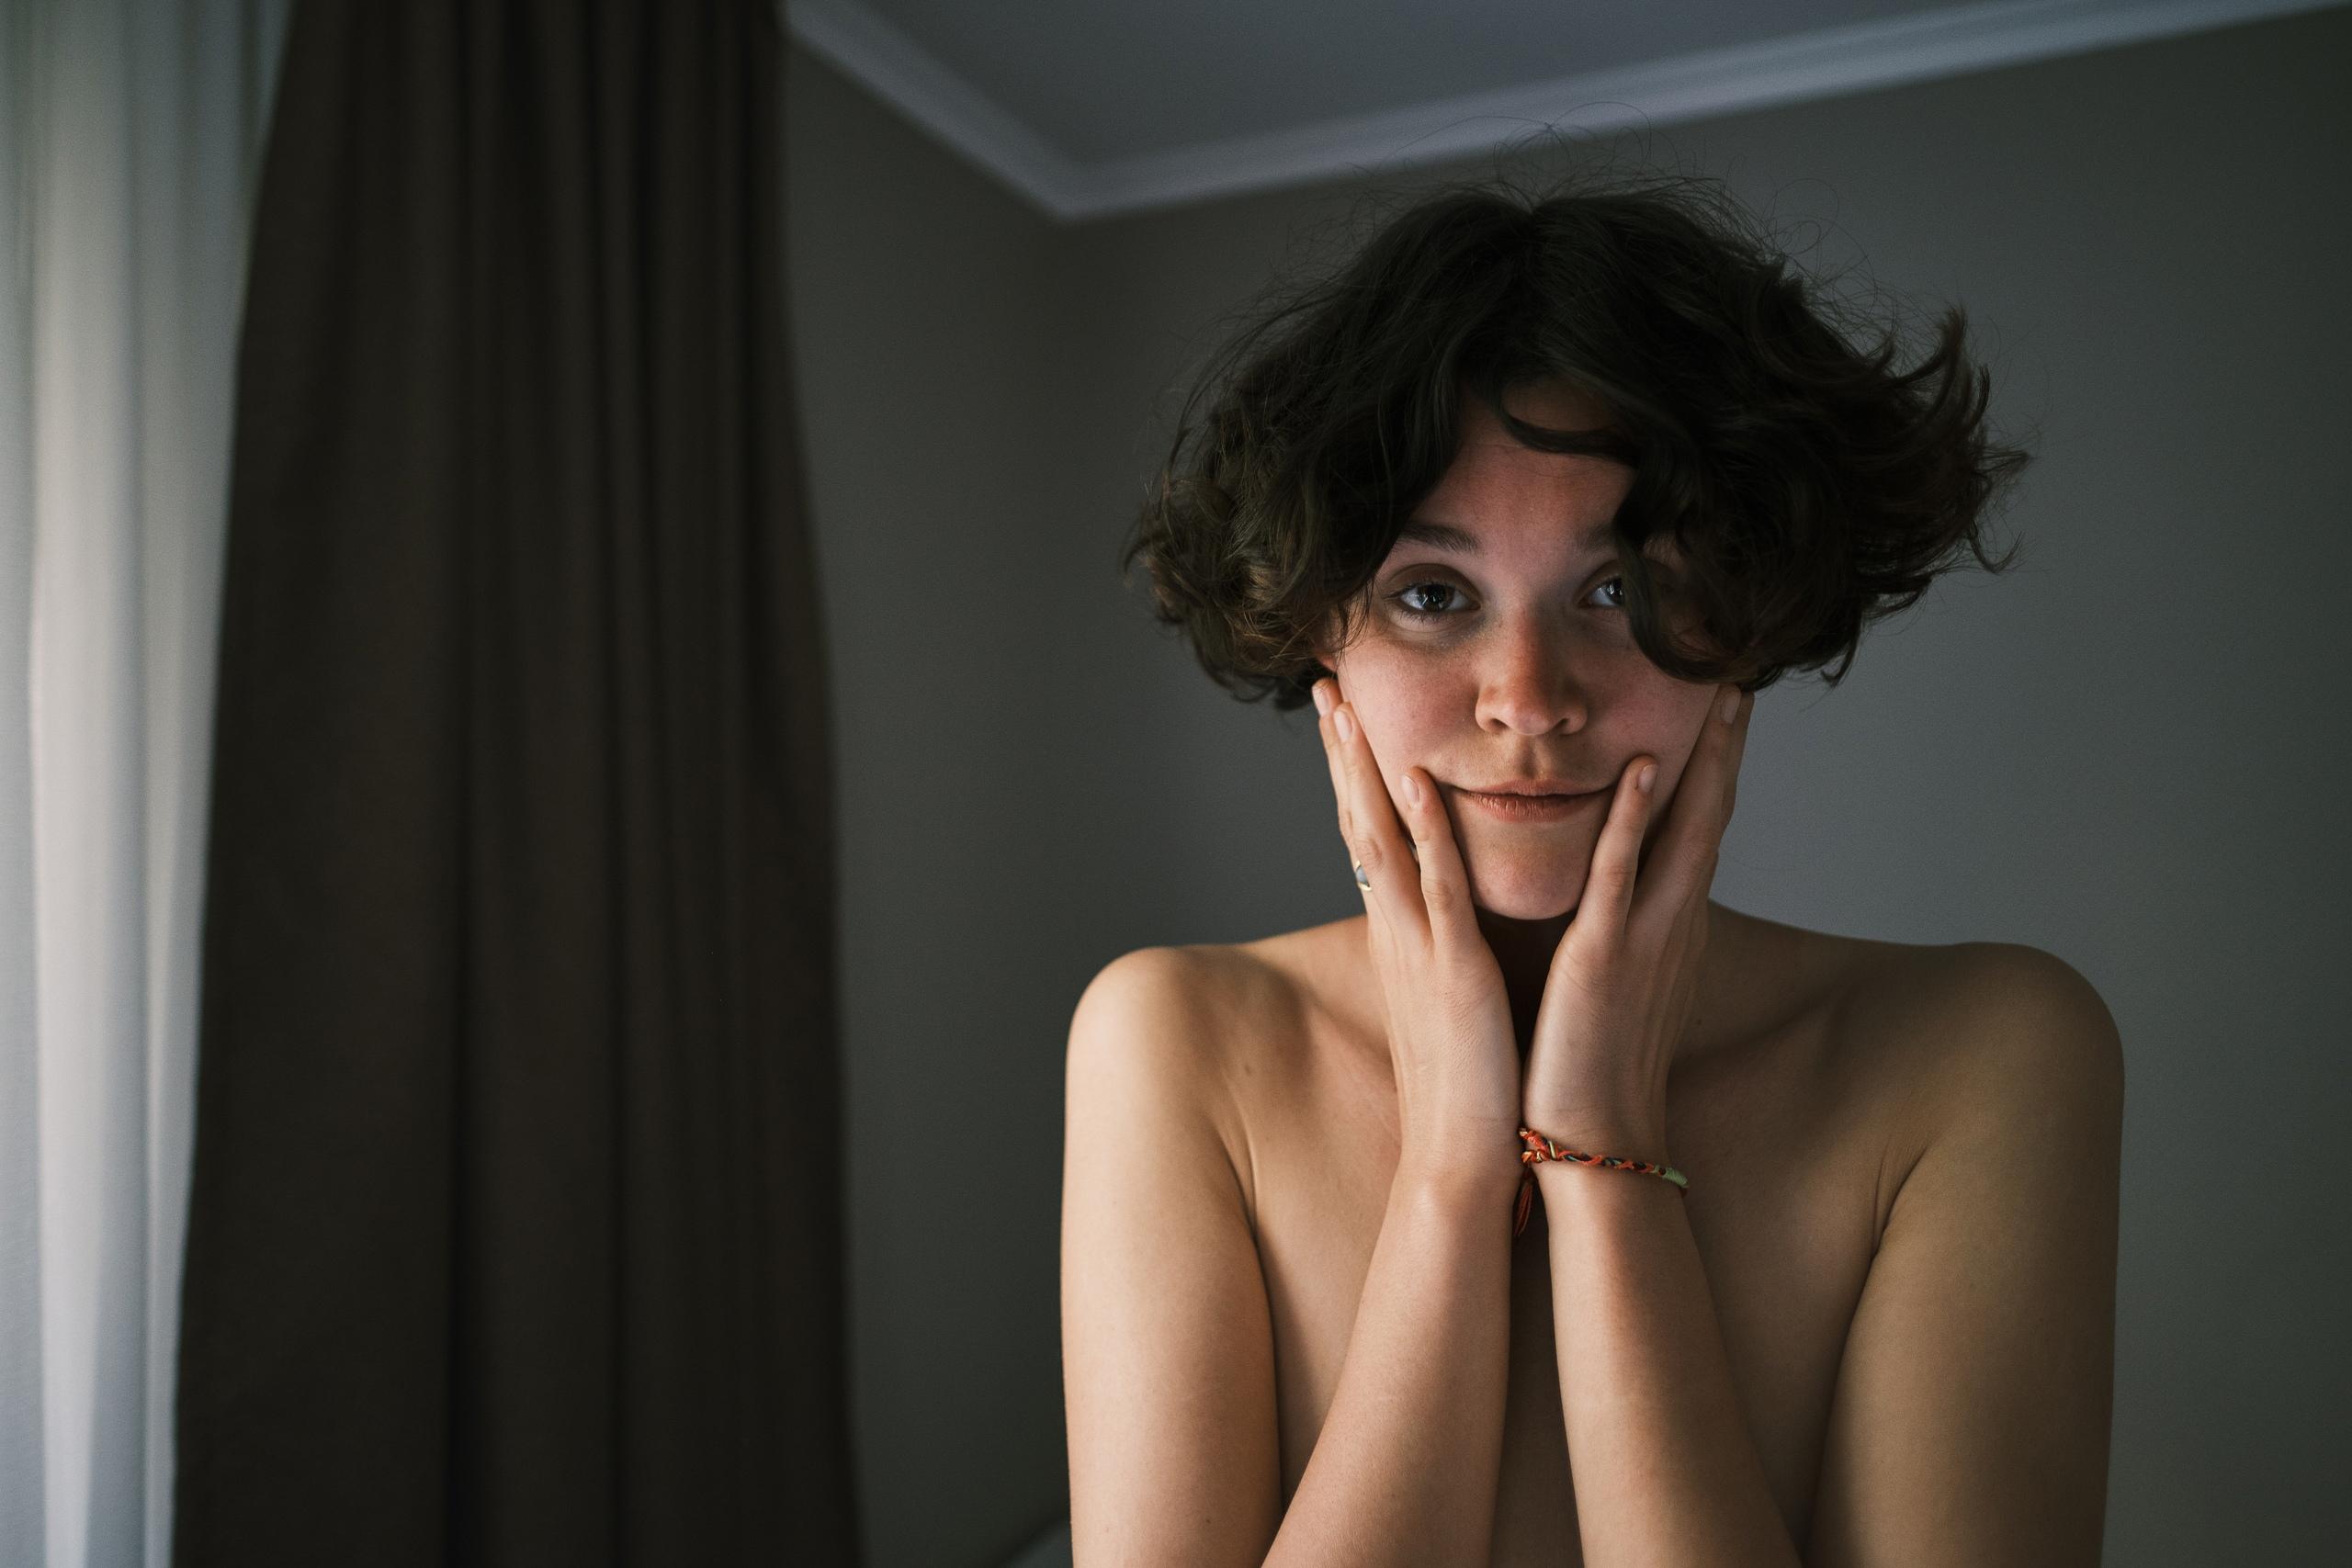 https://www.youngfolks.ru/pub/photographer-sergey-viktorovich